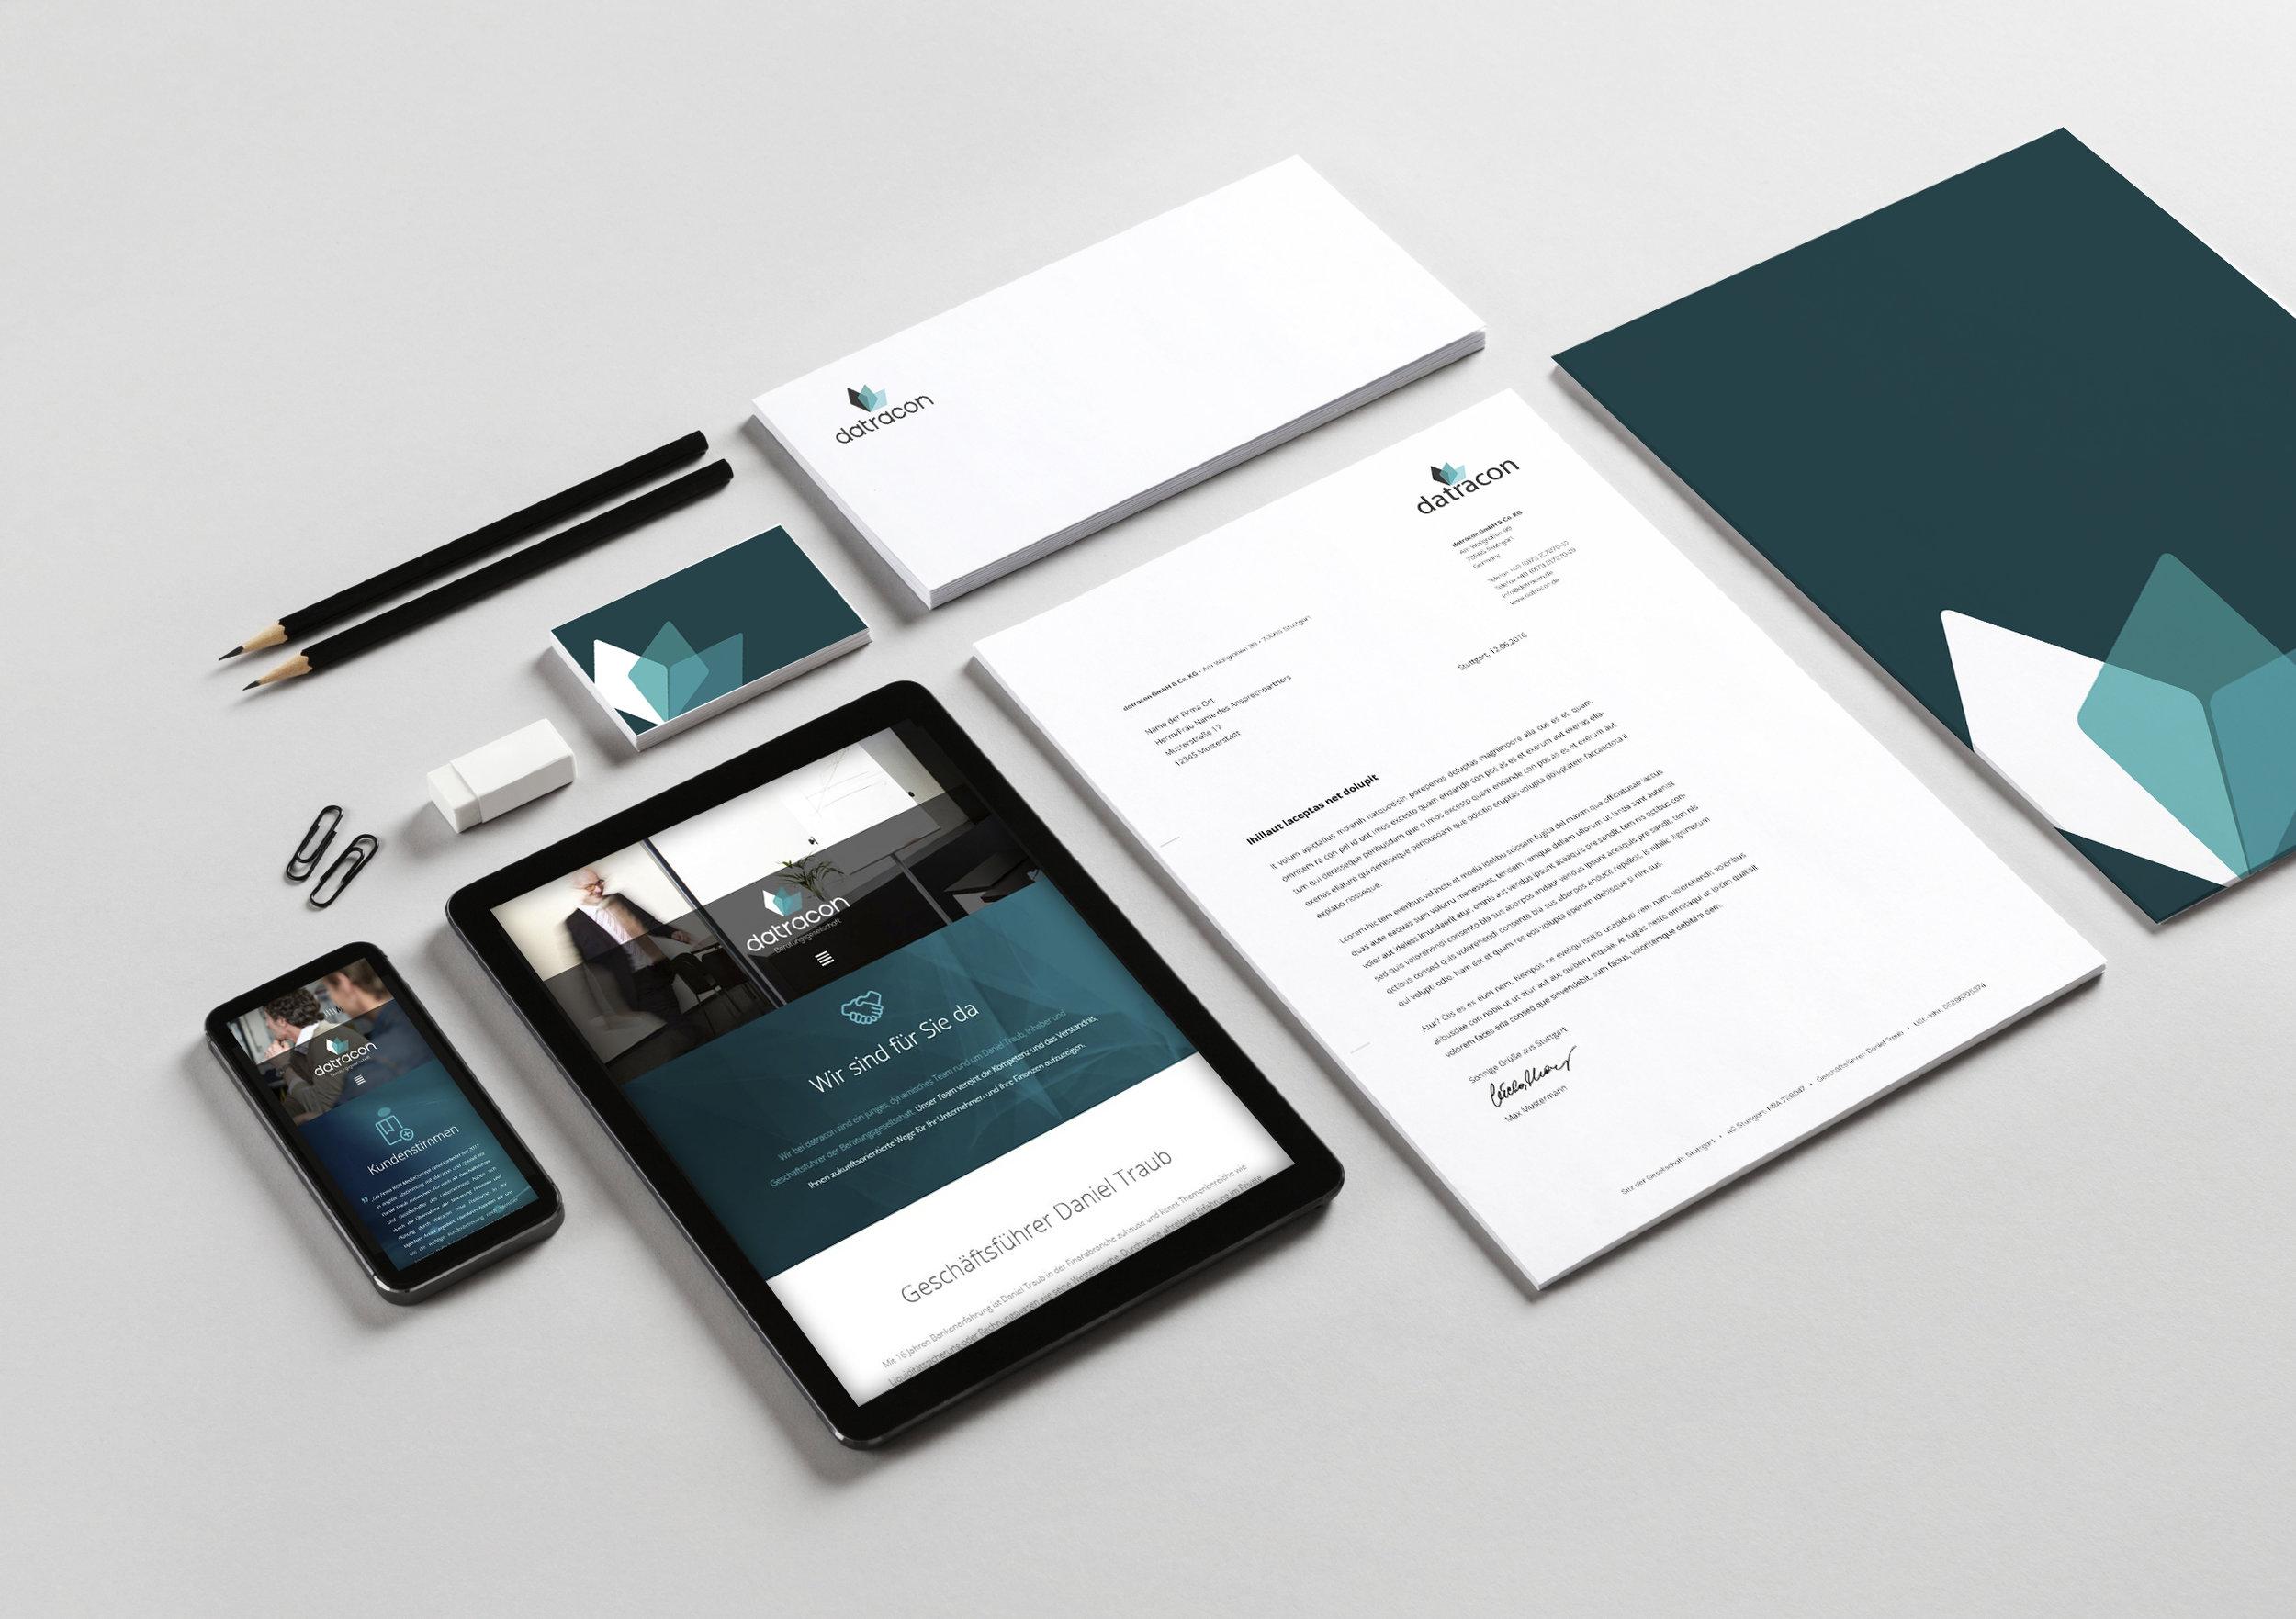 >     CI-/CD-Entwicklung   >     Web-Design   >     Geschäftsausstattung   >     Werbemittel